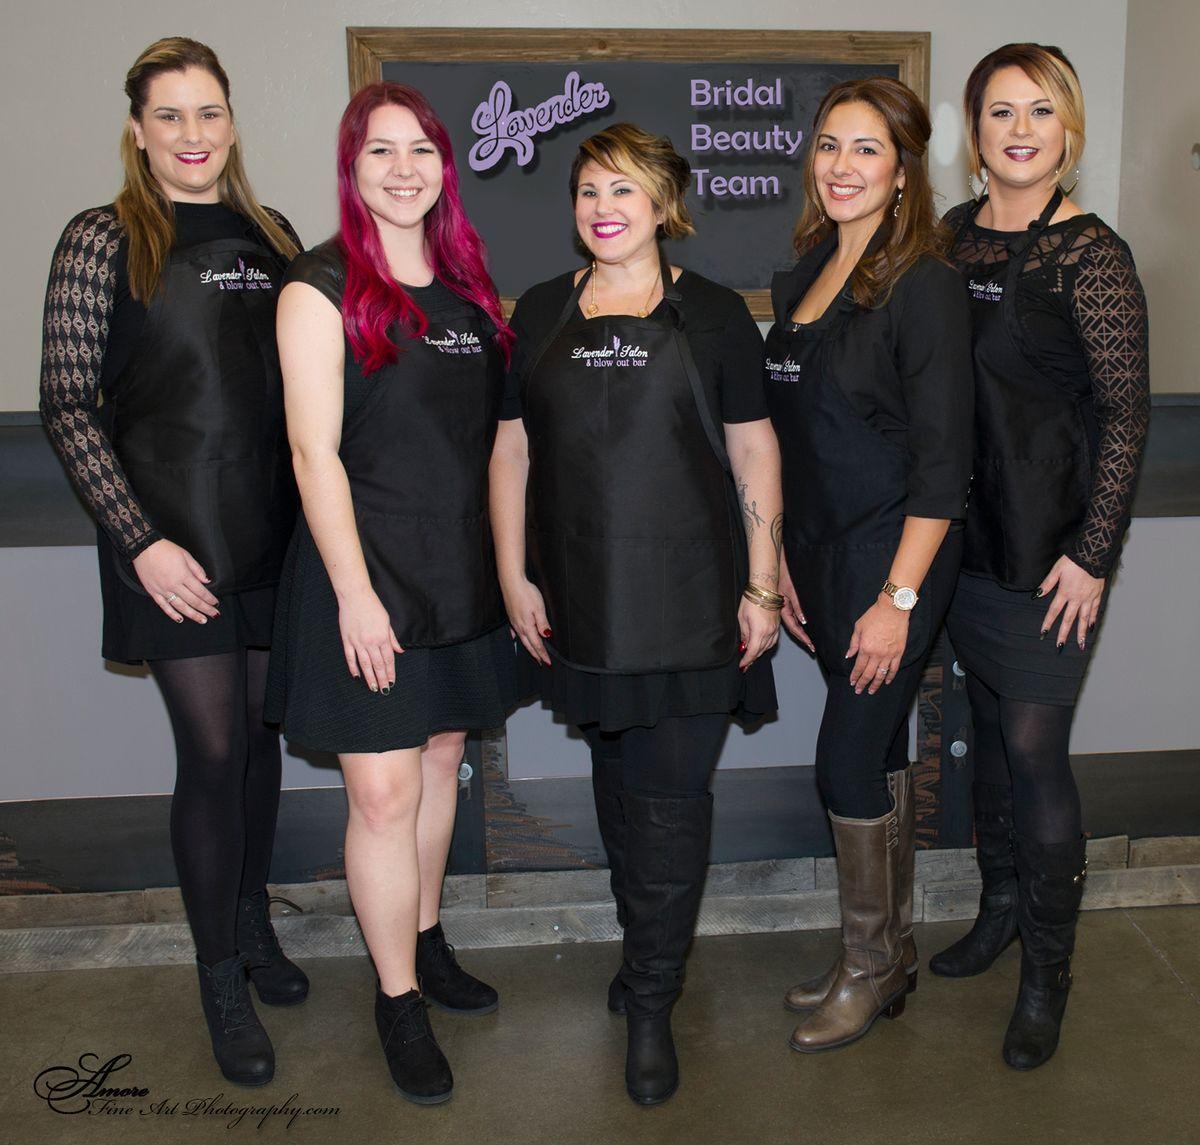 Bridal Beauty Team 2 copy.jpg